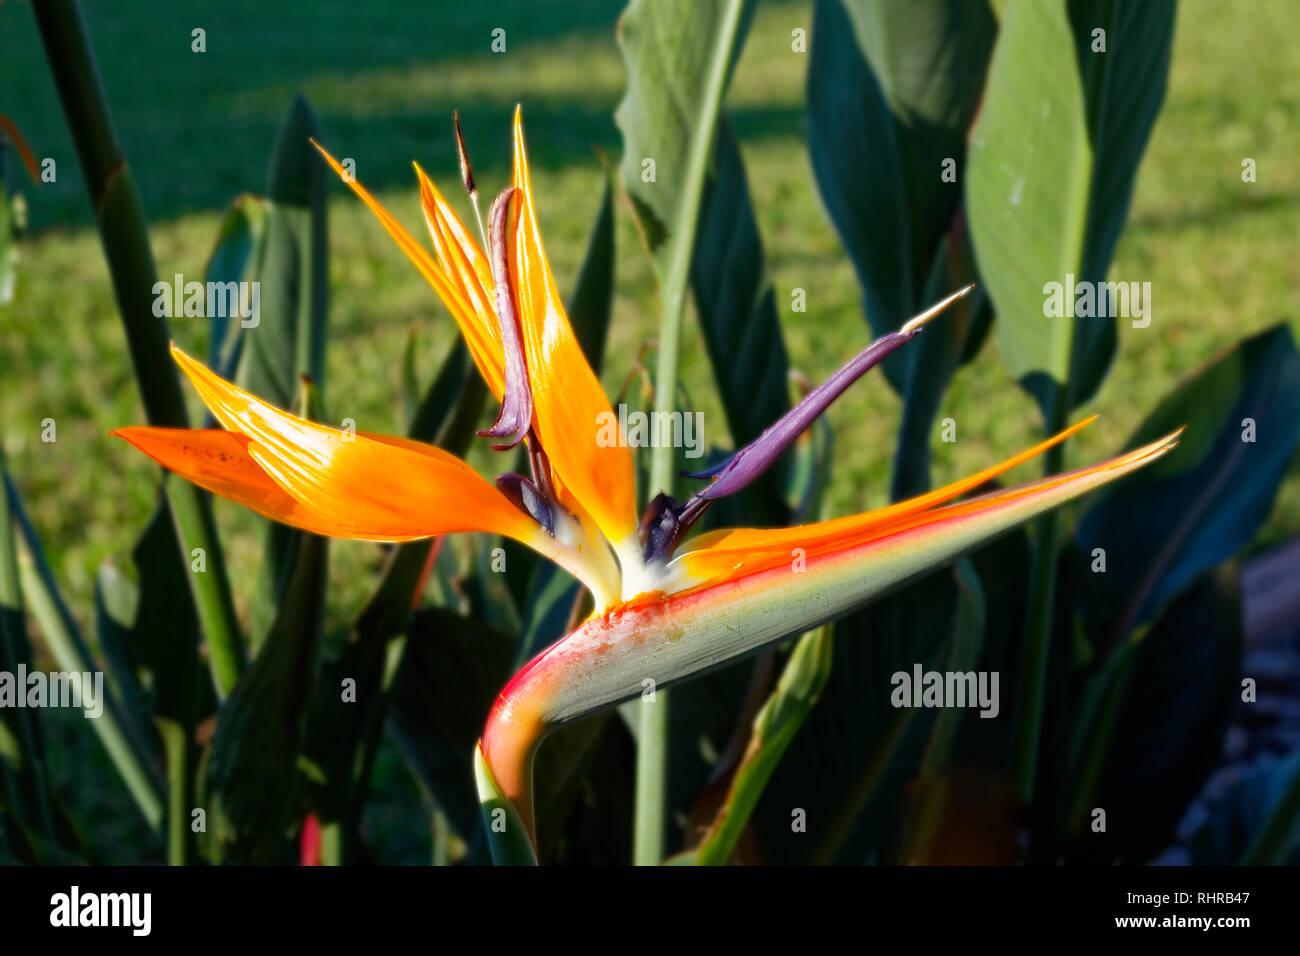 Bird of Paradise, cultivated flower, colorful, unique, nature, Crane flower, tropical, symbolize joyfulness, Strelitzia, green foliage, FL, Florida, h - Stock Image